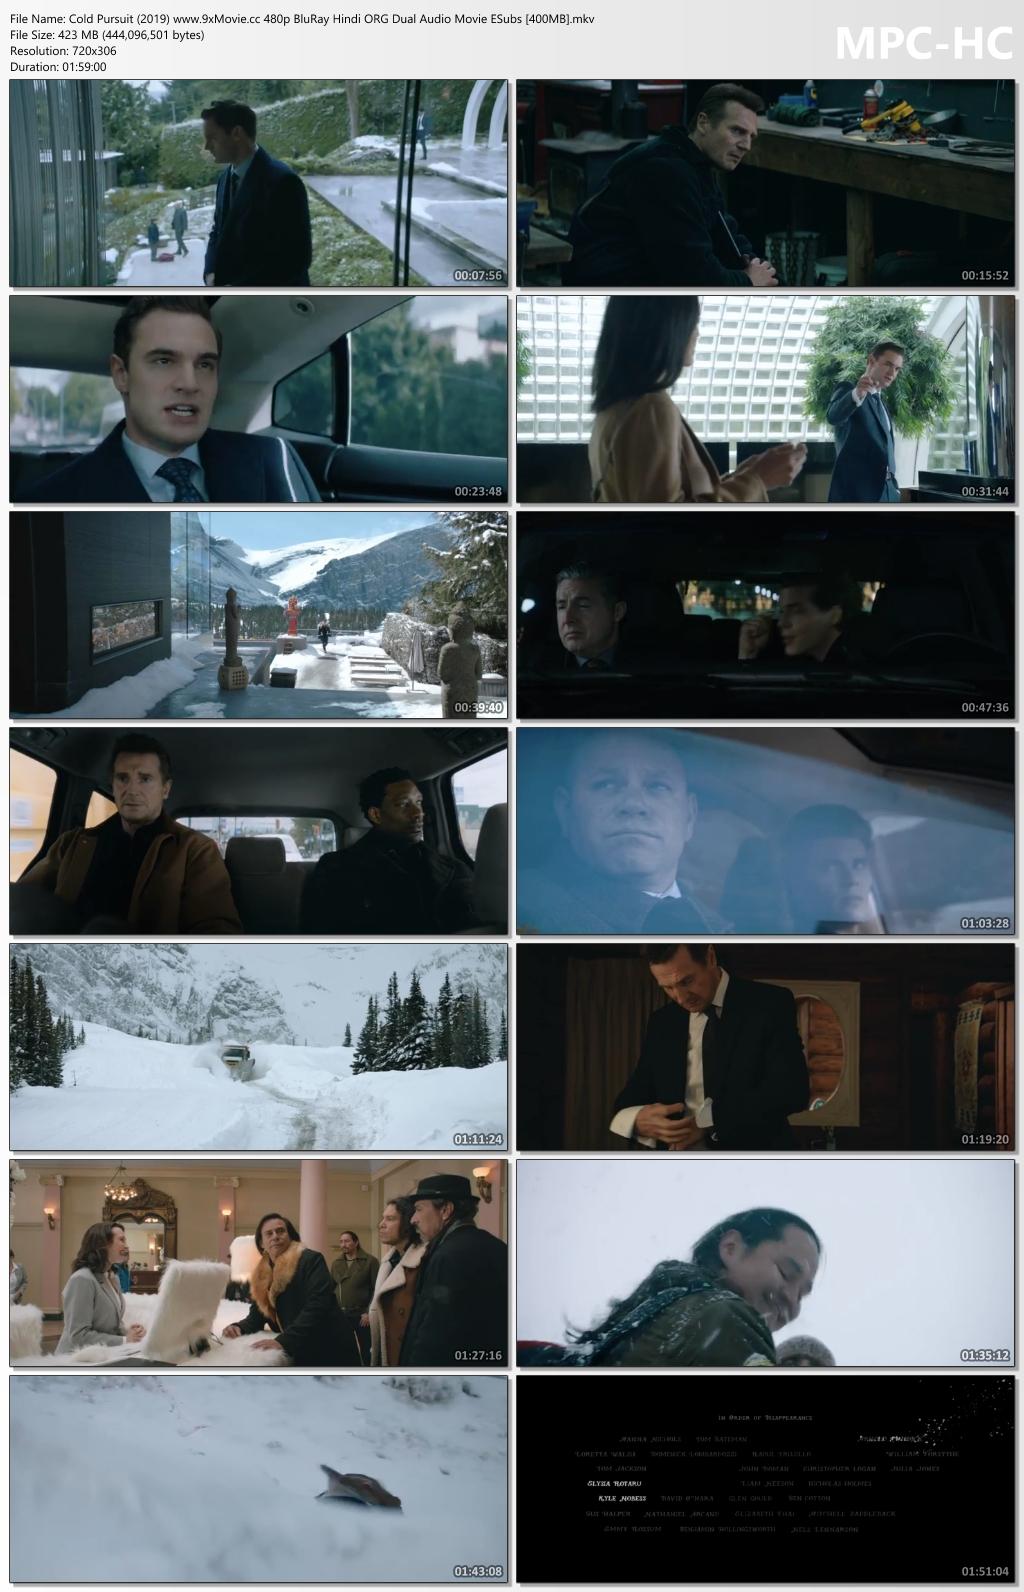 Cold-Pursuit-2019-www-9x-Movie-cc-480p-Blu-Ray-Hindi-ORG-Dual-Audio-Movie-ESubs-400-MB-mkv